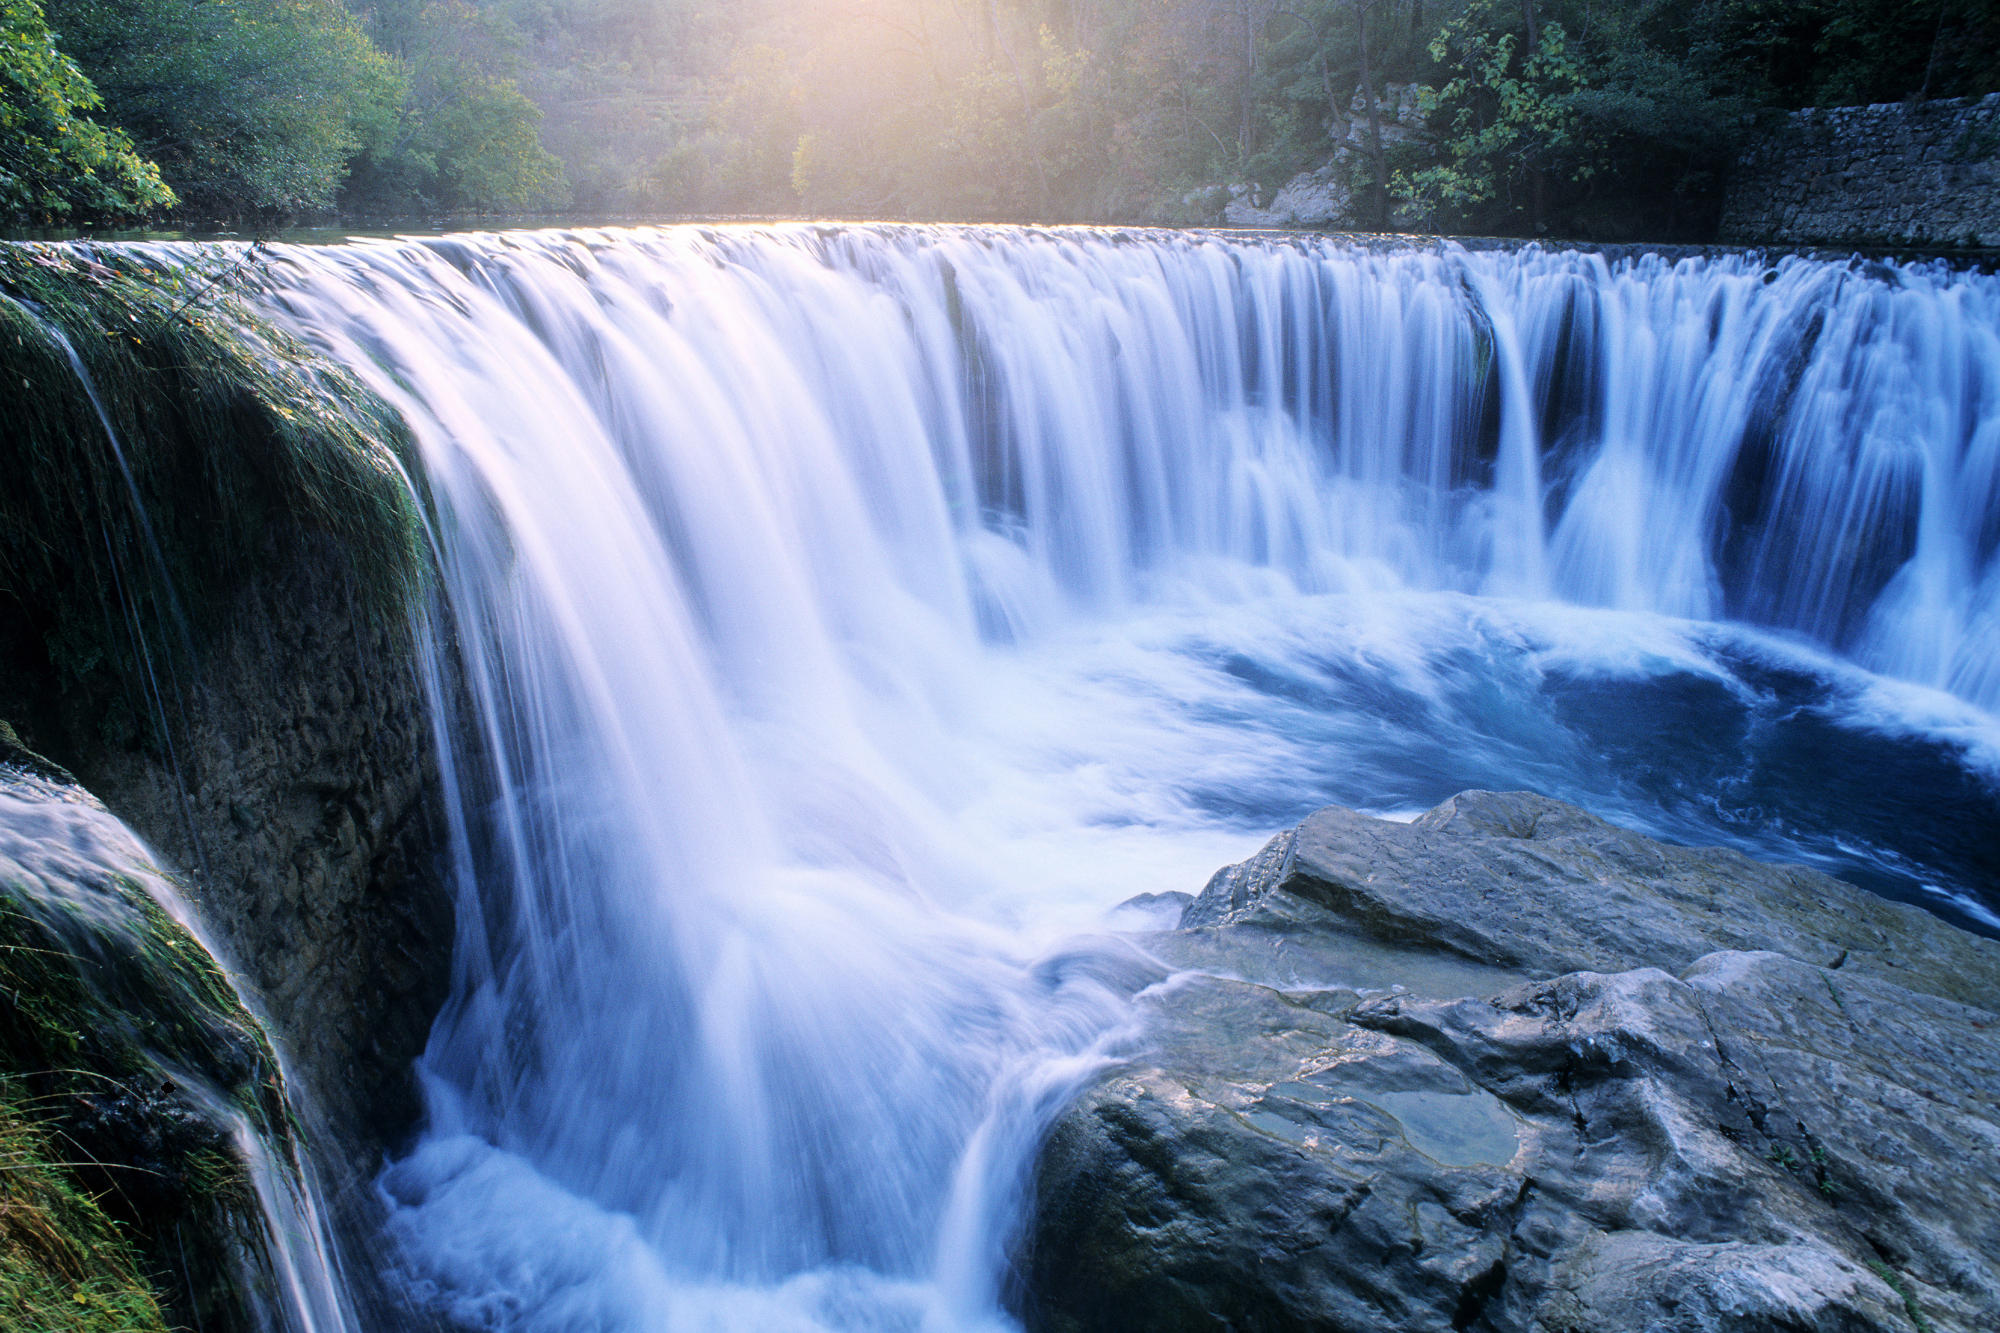 waterfall 1920x1080p